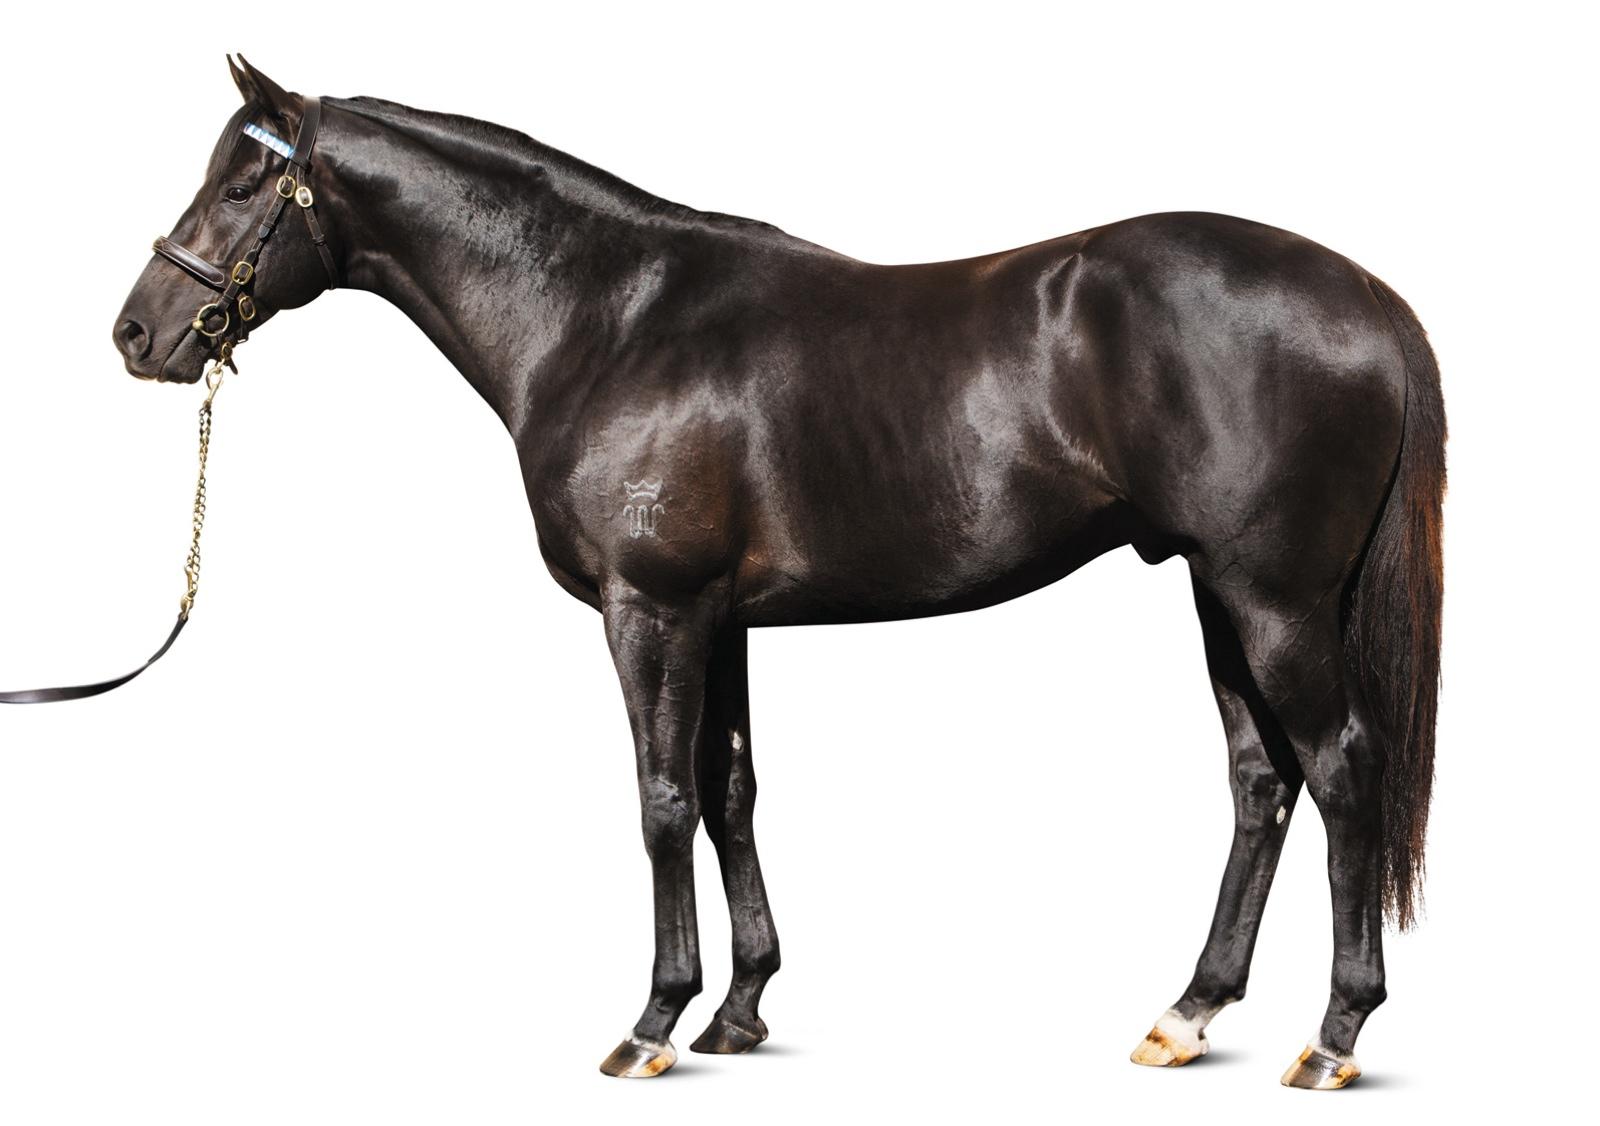 https://www.stallions.com.au/wp-content/uploads/2019/10/103553100.jpg